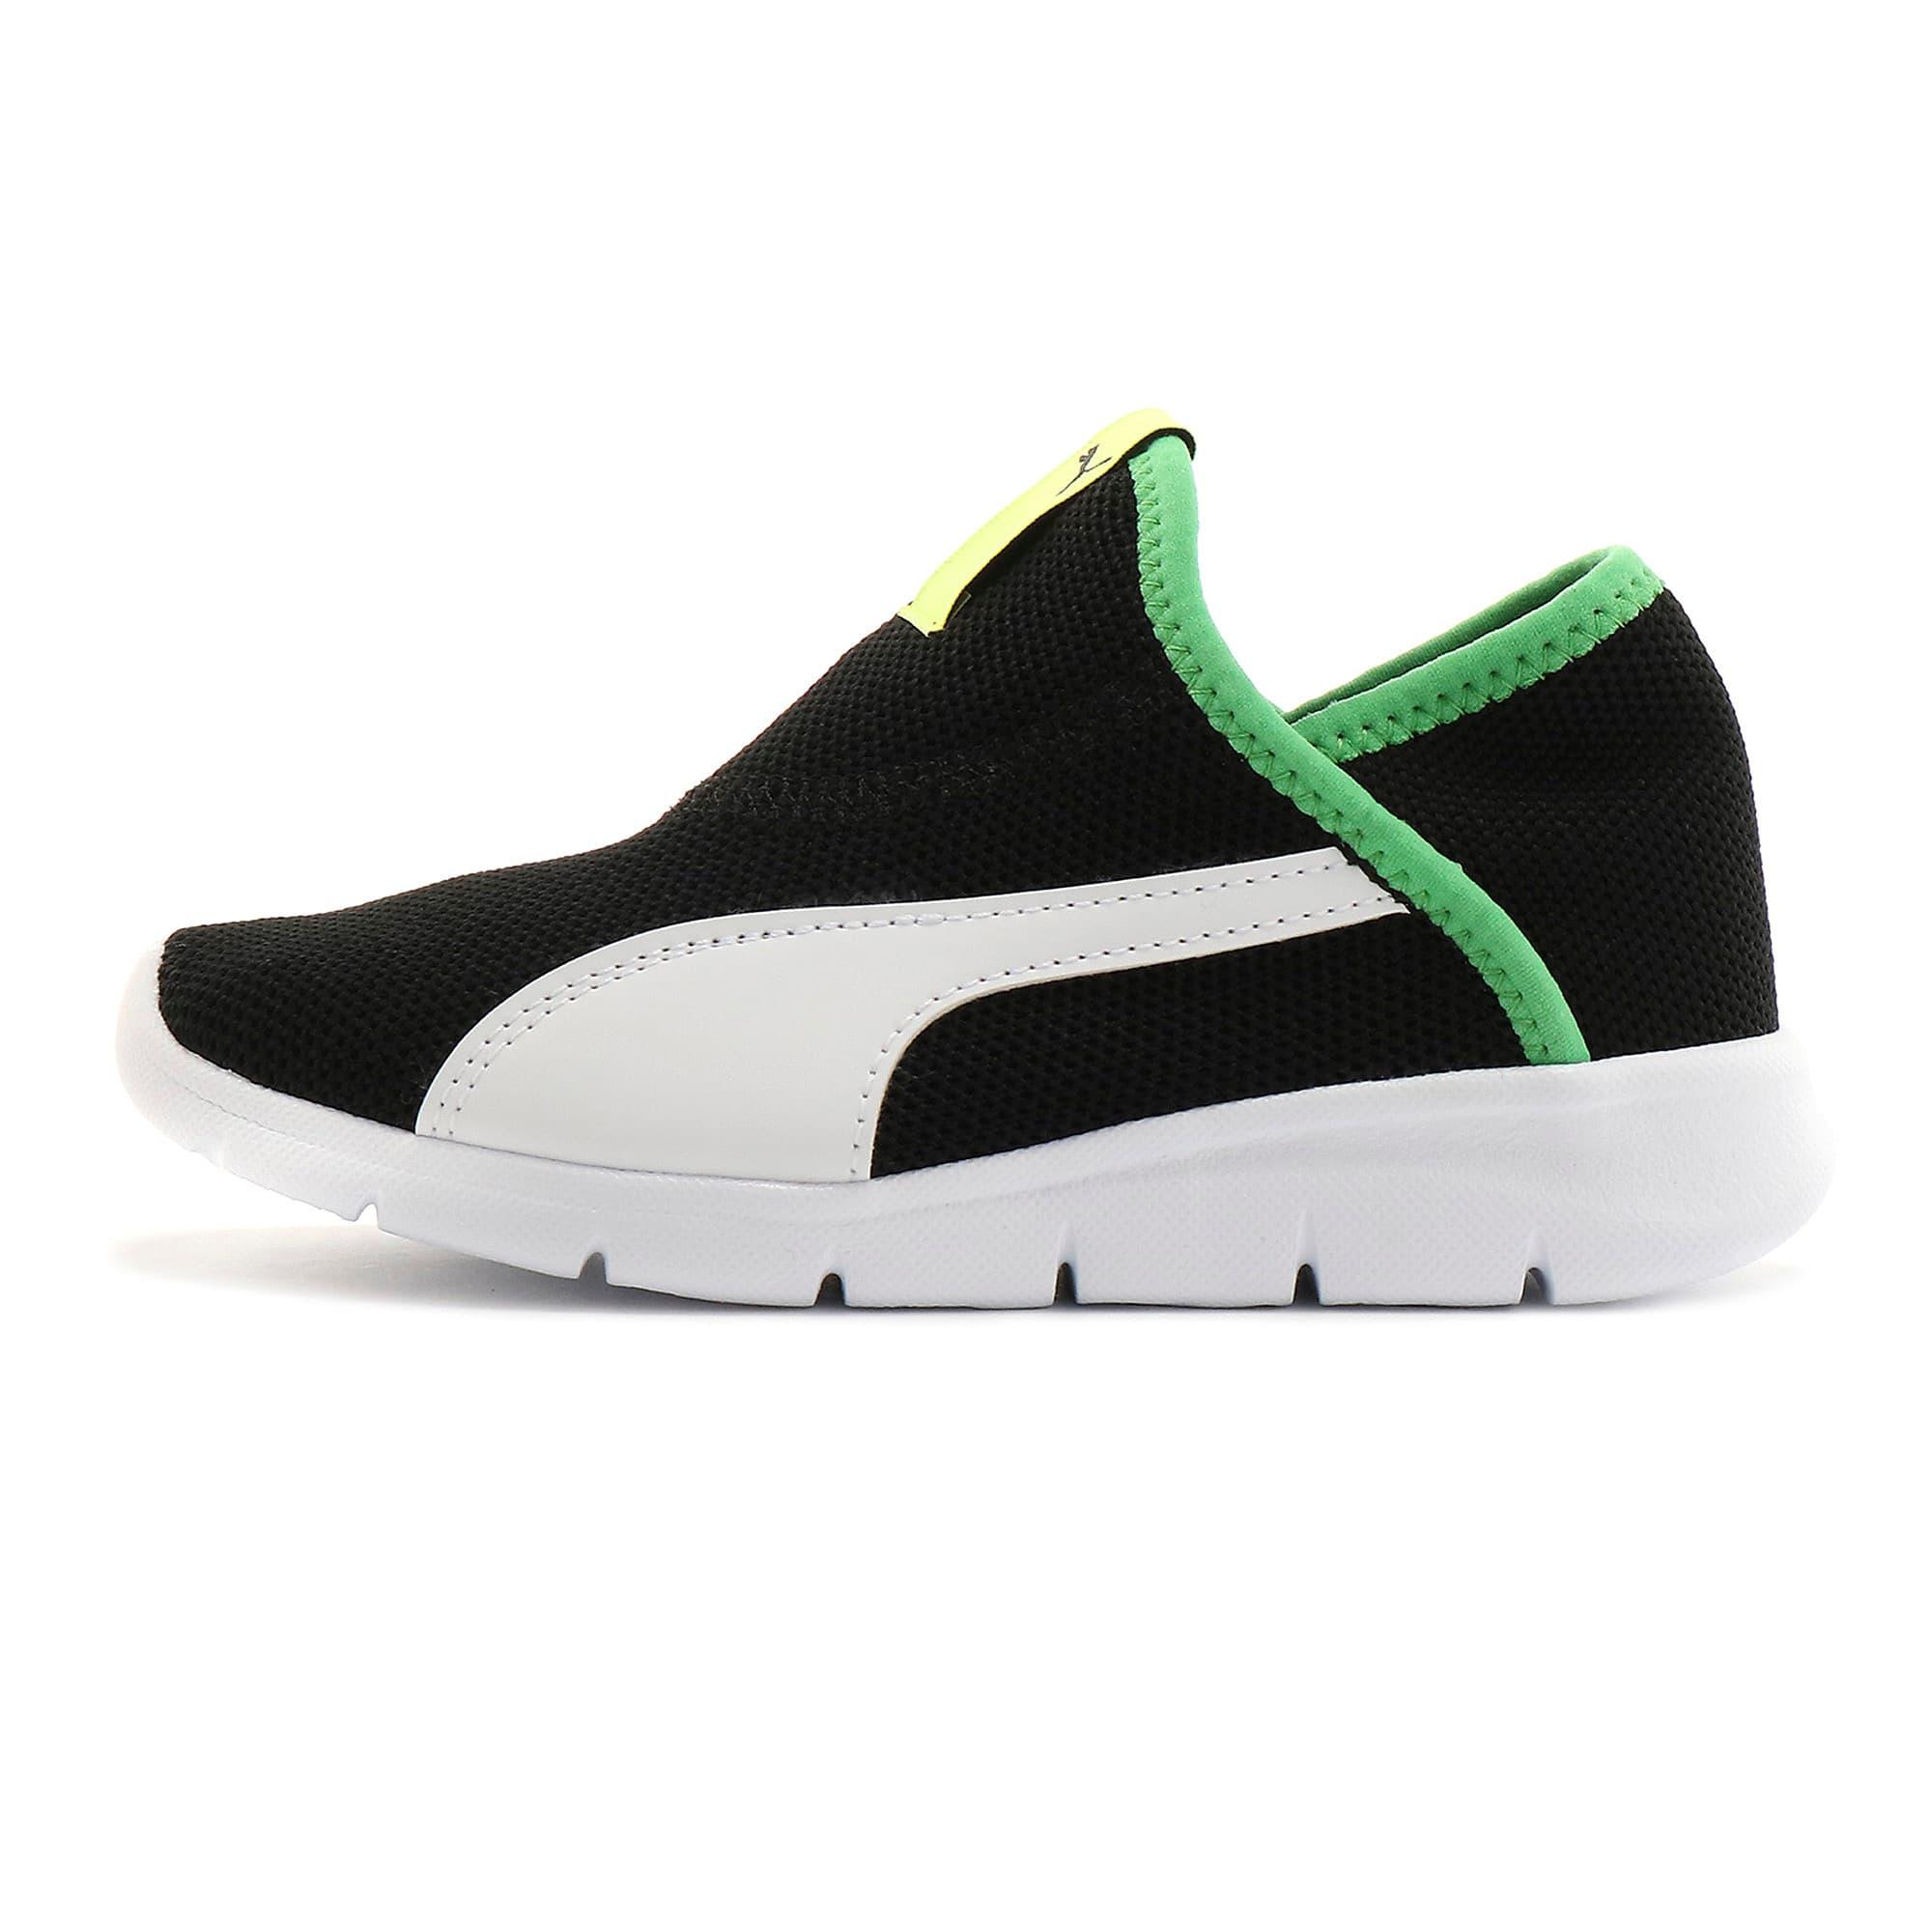 Thumbnail 1 of キッズ プーマ バオ 3 ソック PS 17-21cm, Puma Black-White-Irish Green, medium-JPN